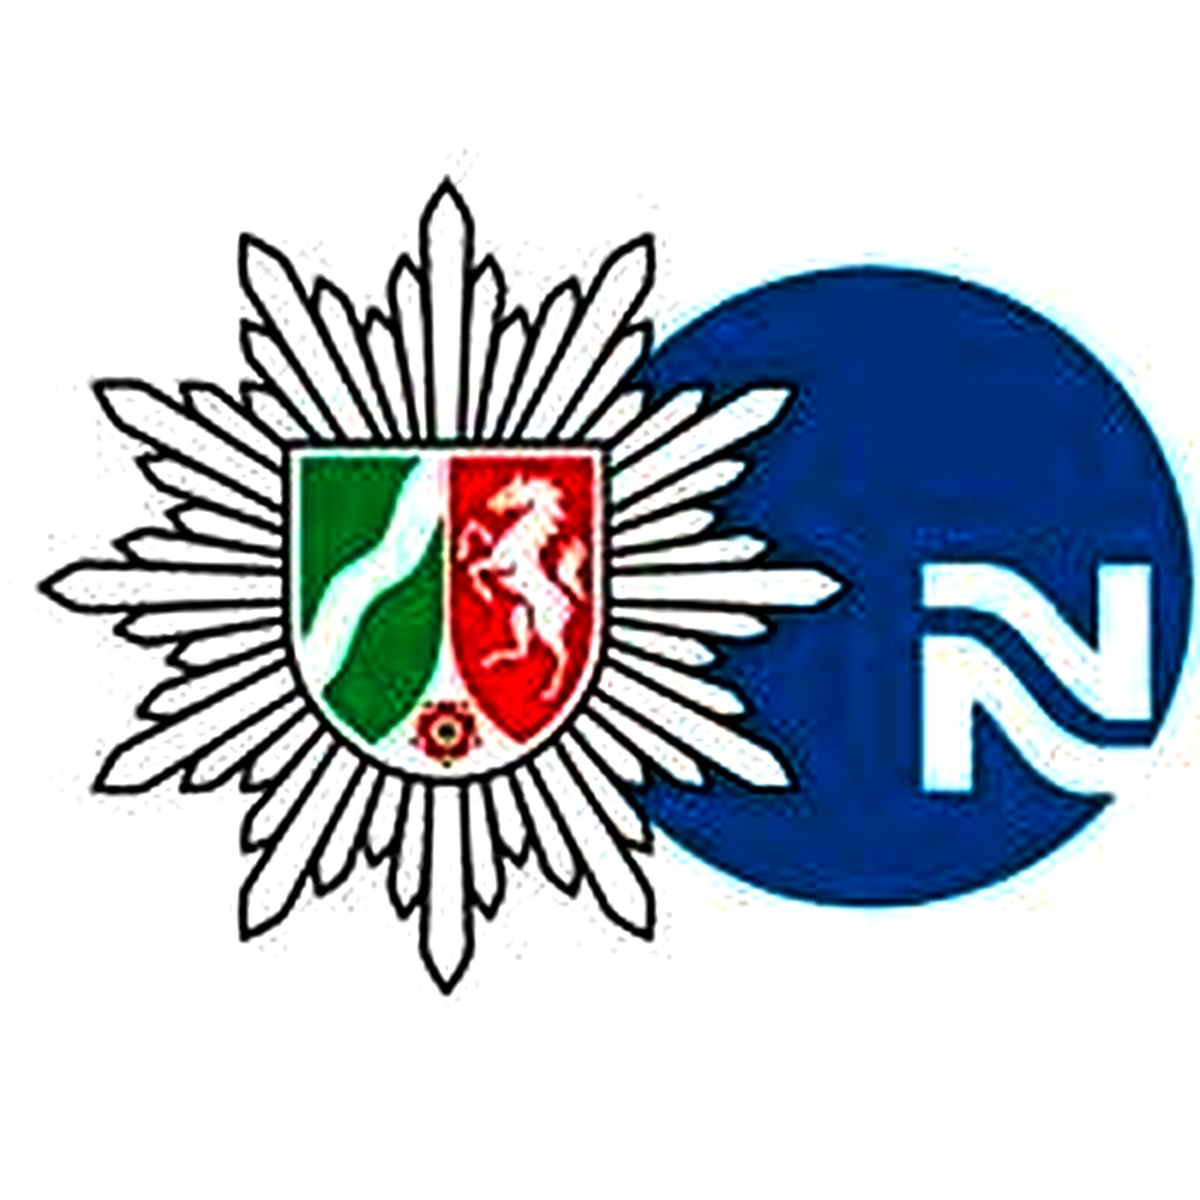 Foto by: Screenshot Polizei Klve NRW